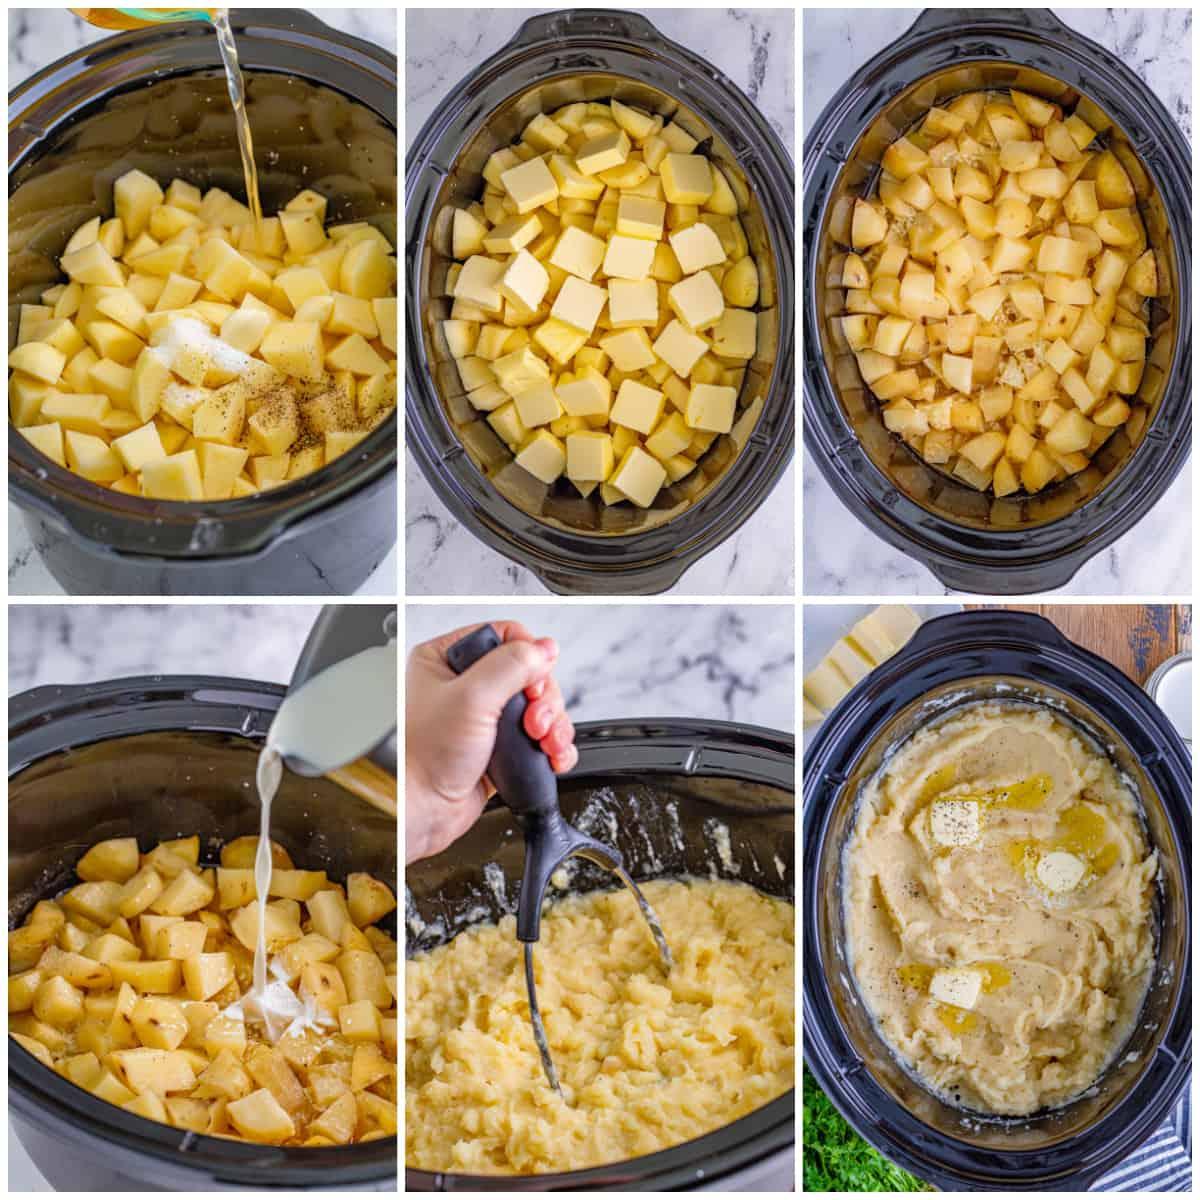 Step by step photos on how to make Crockpot Mashed Potatoes